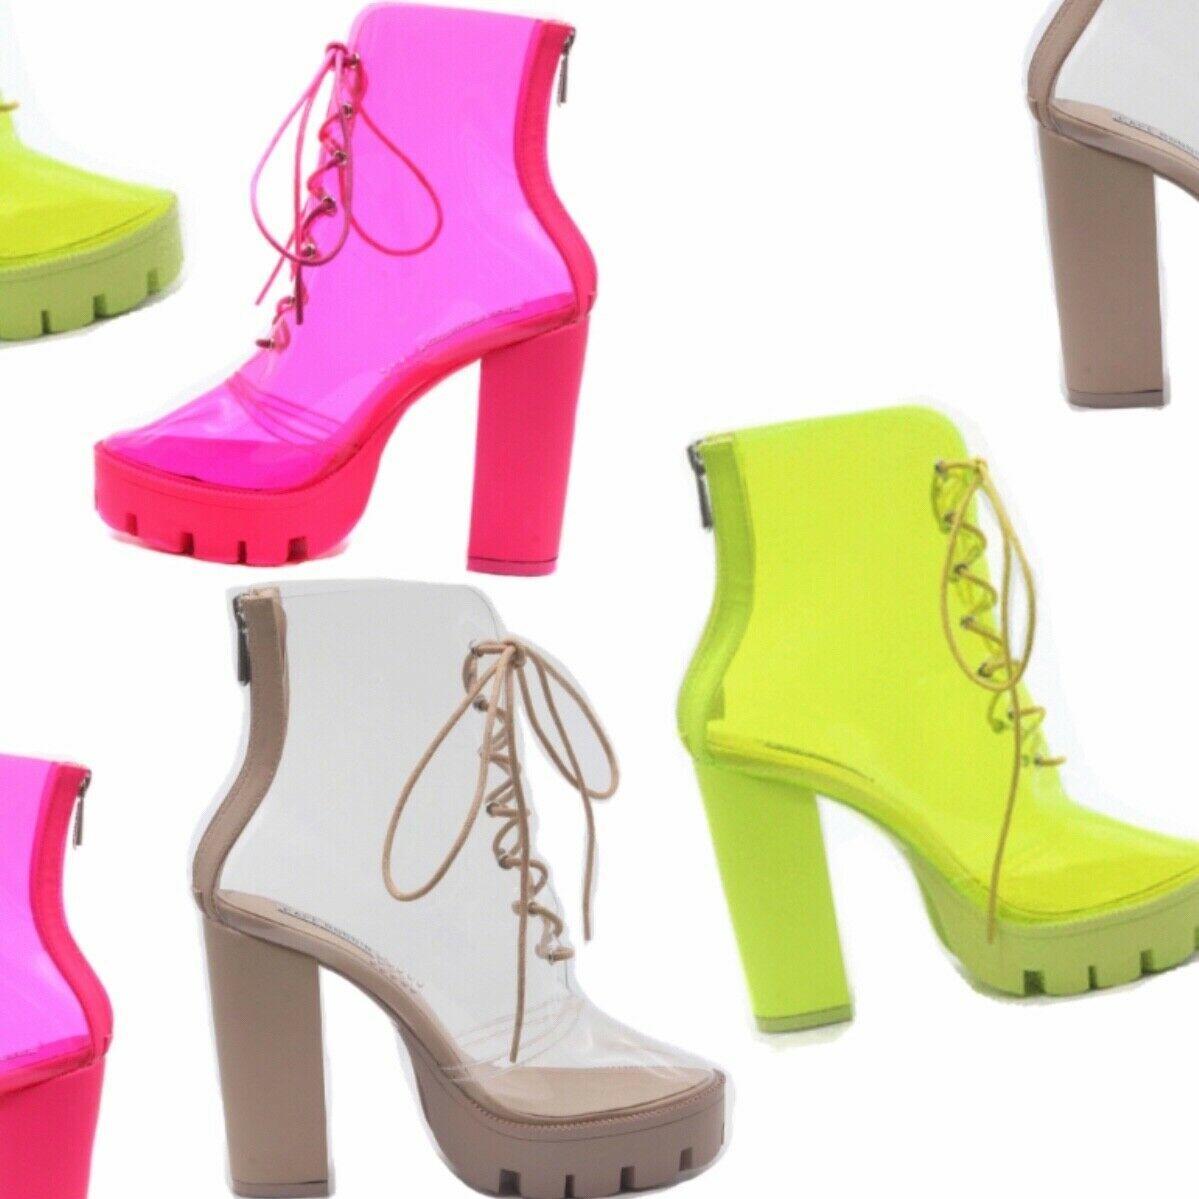 Cape Robbin CYBIL Neon Pink Clear Lace Up Lug Platform Chunky Block Heel Bootie